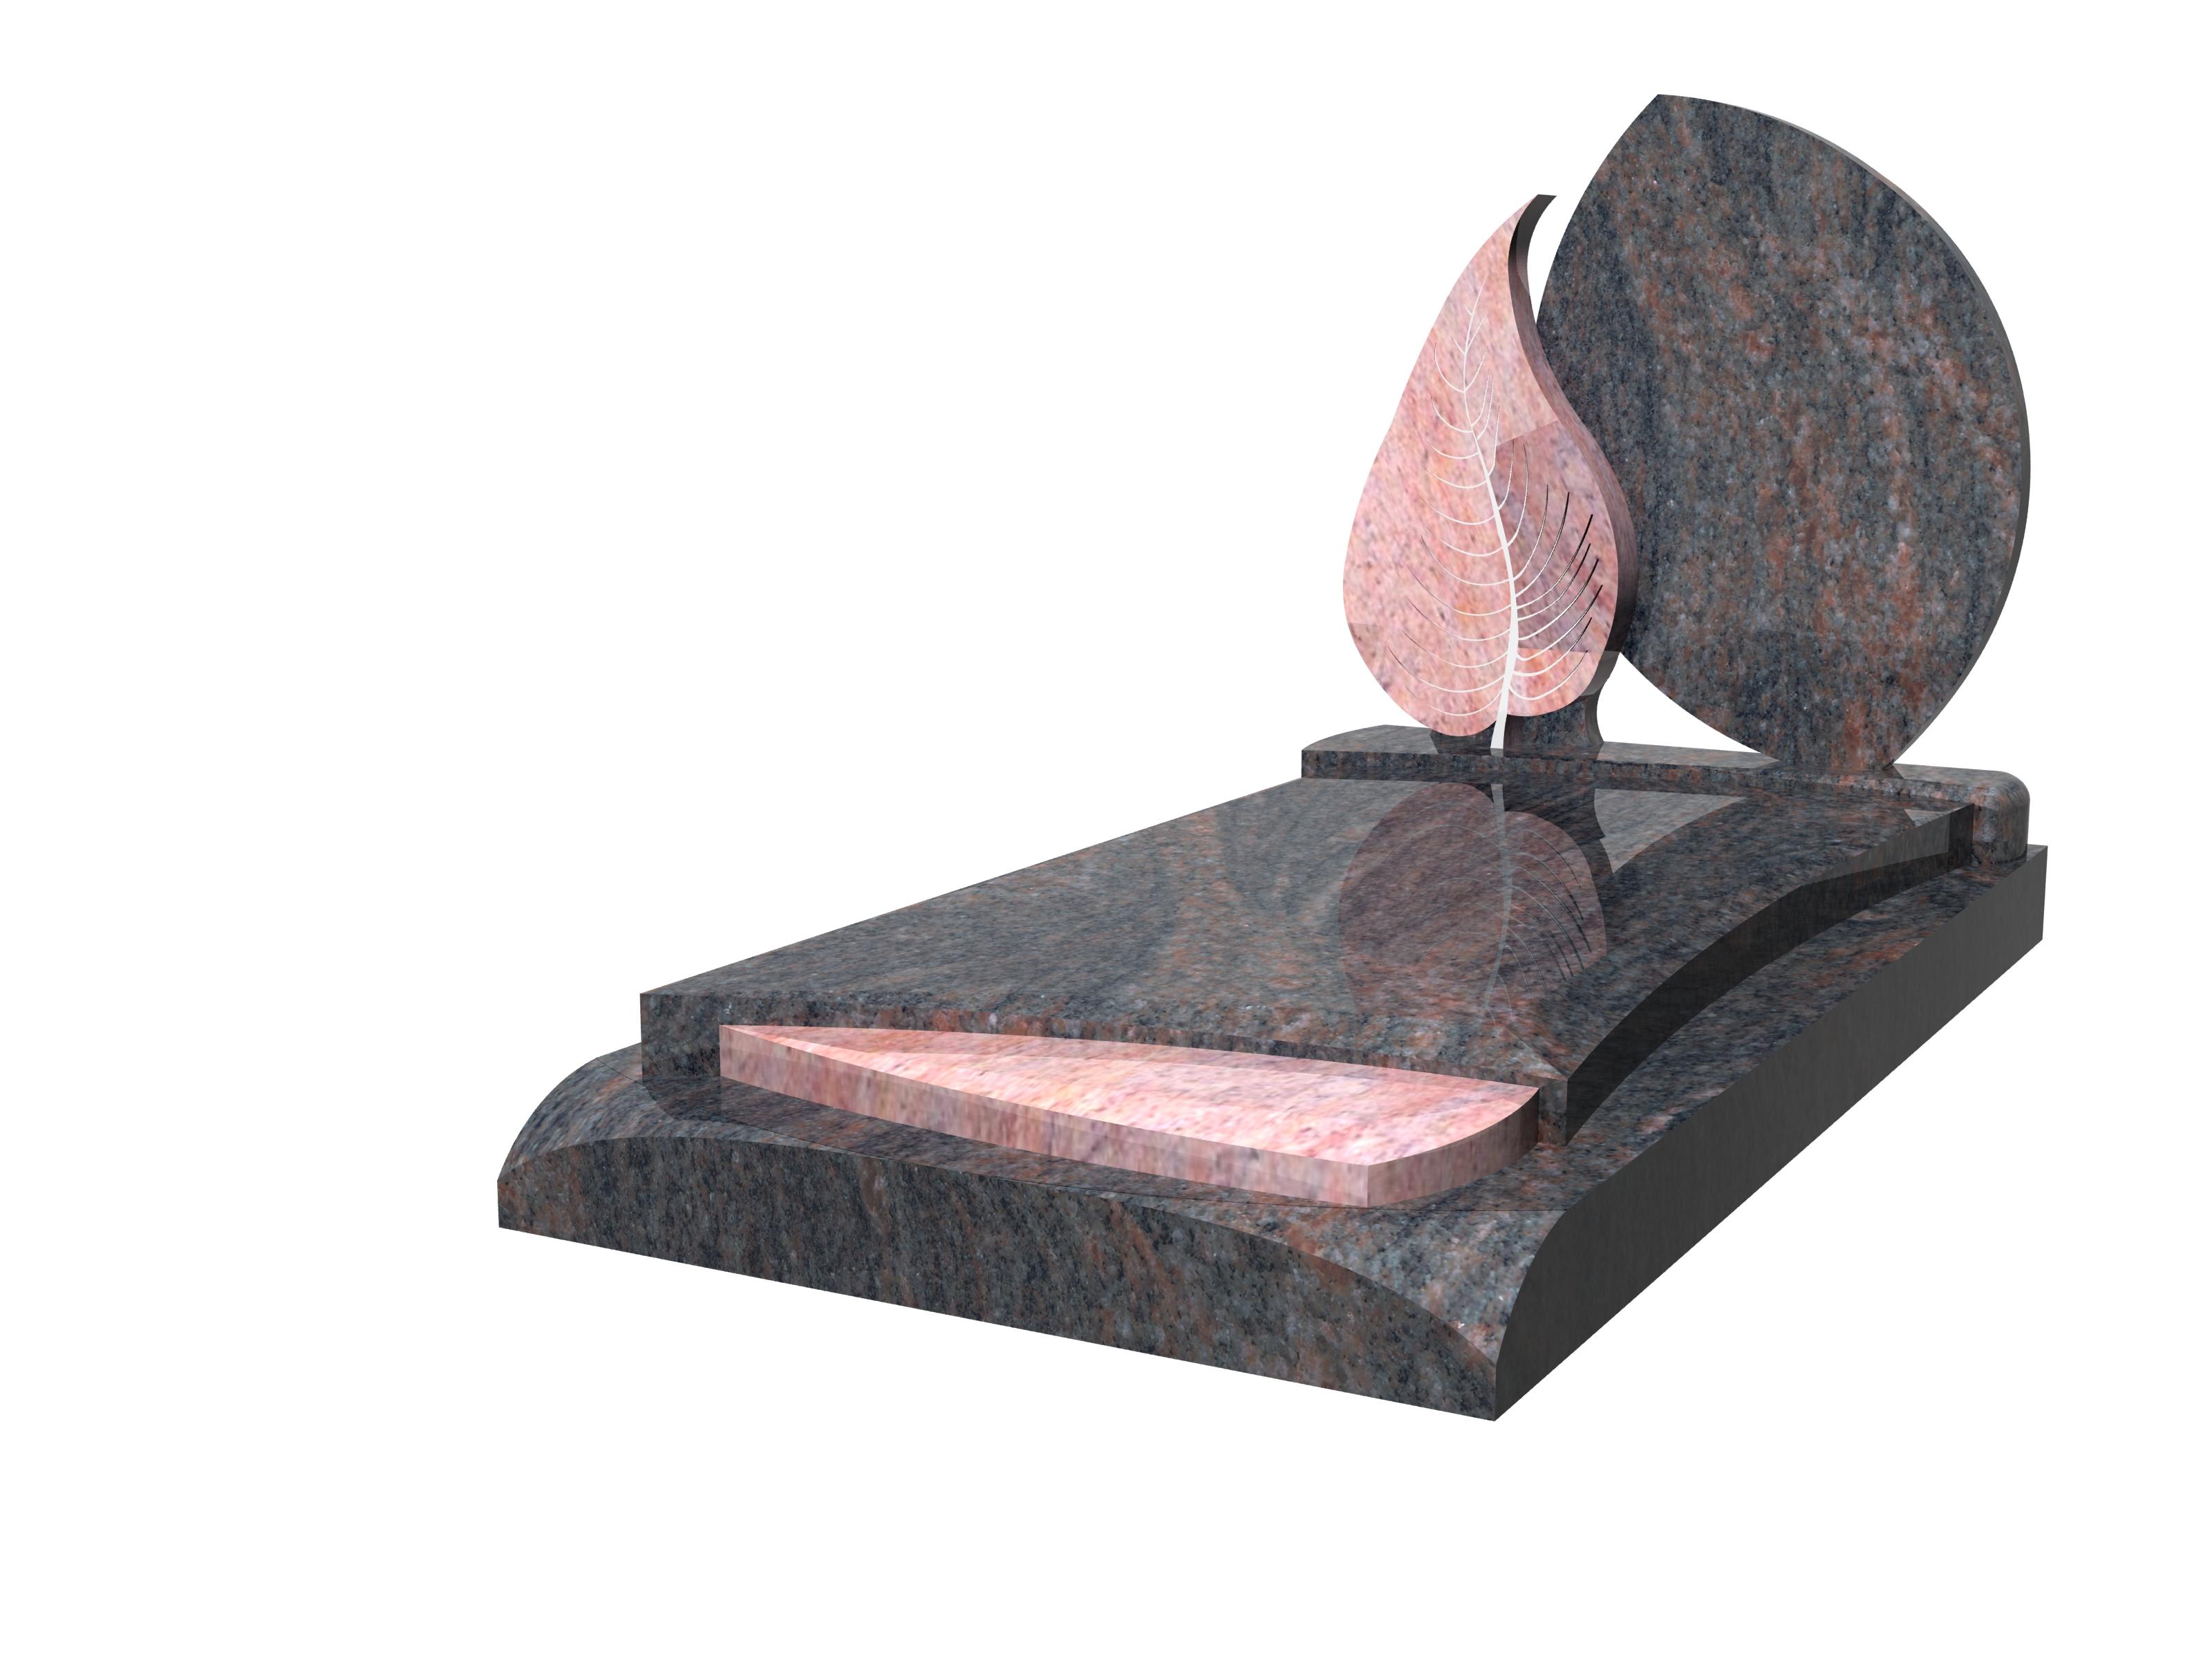 pierre tombale granit rose, pierre tombale granit noir